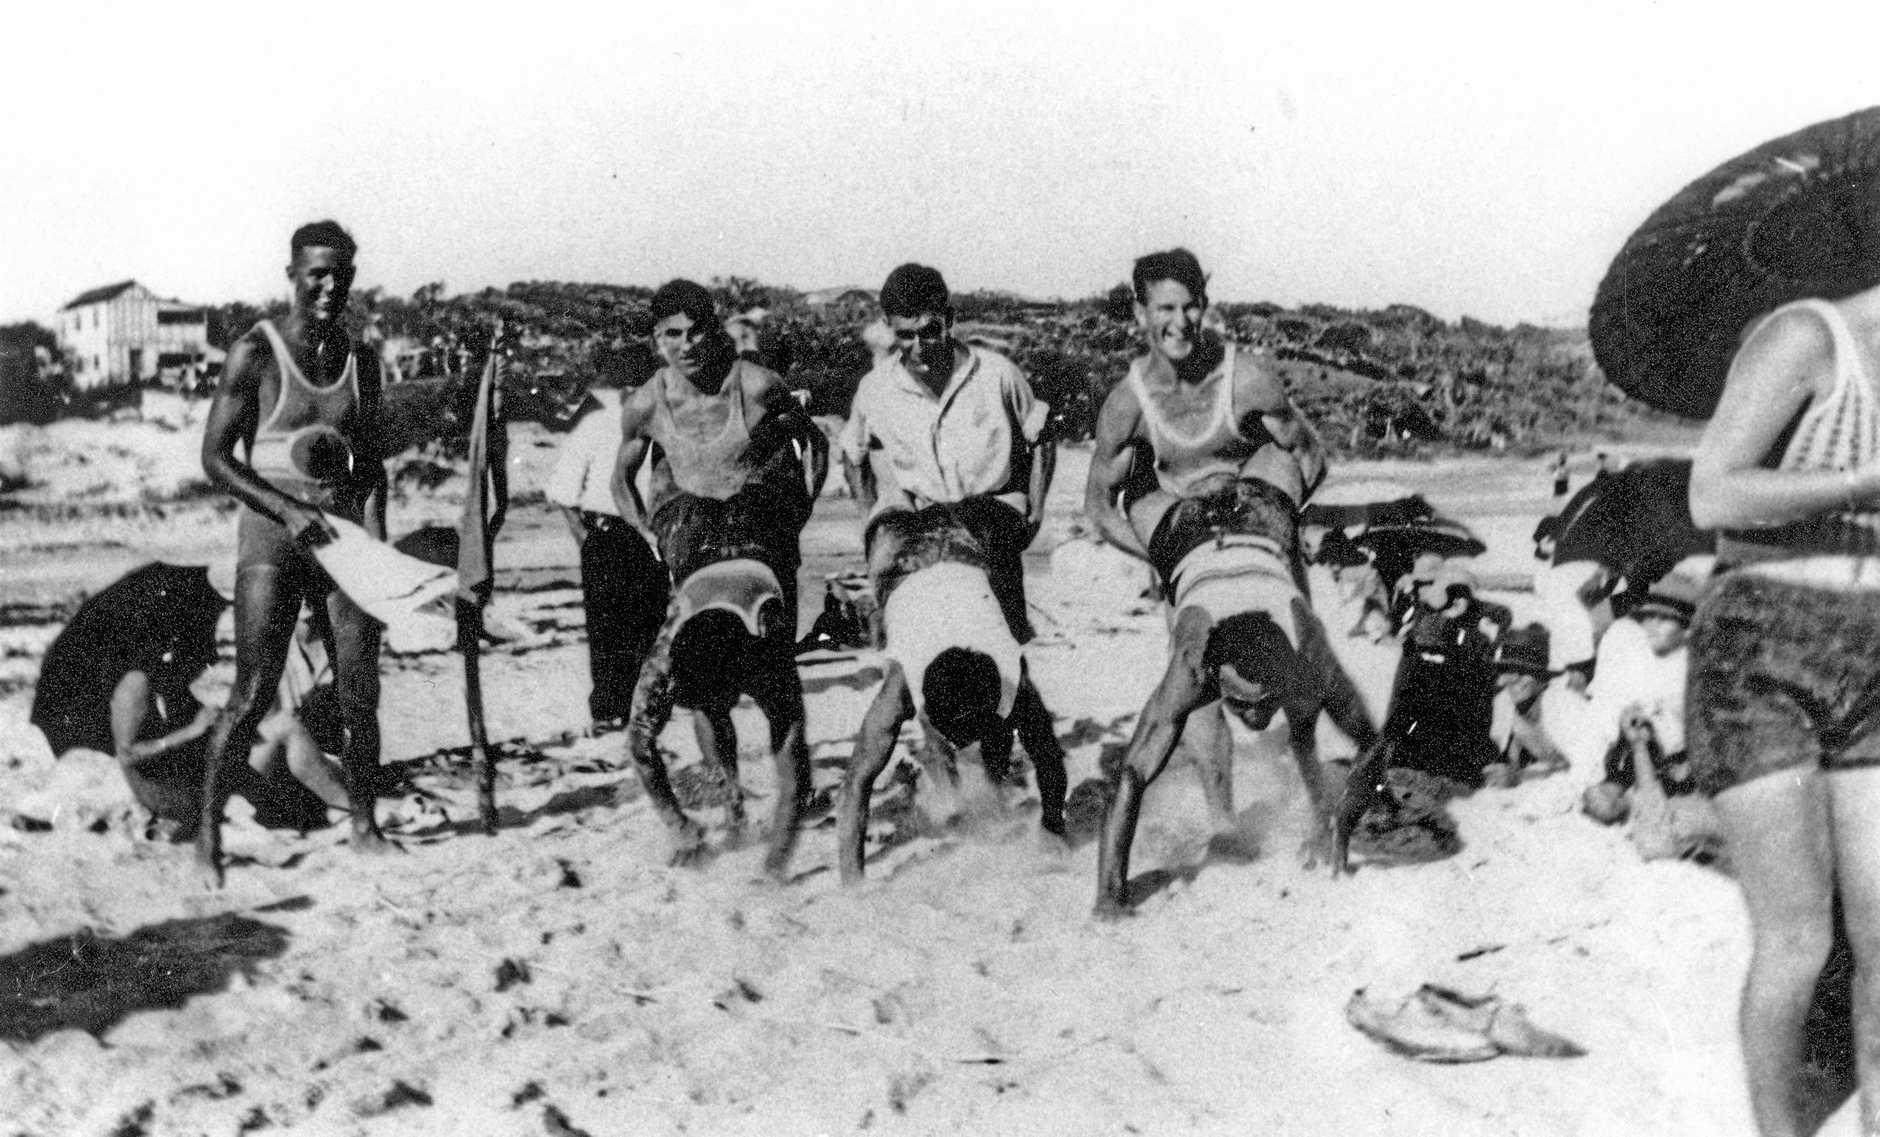 Metropolitan Life Savers getting ready to go in a wheelbarrow race on Kings Beach, ca 1929.